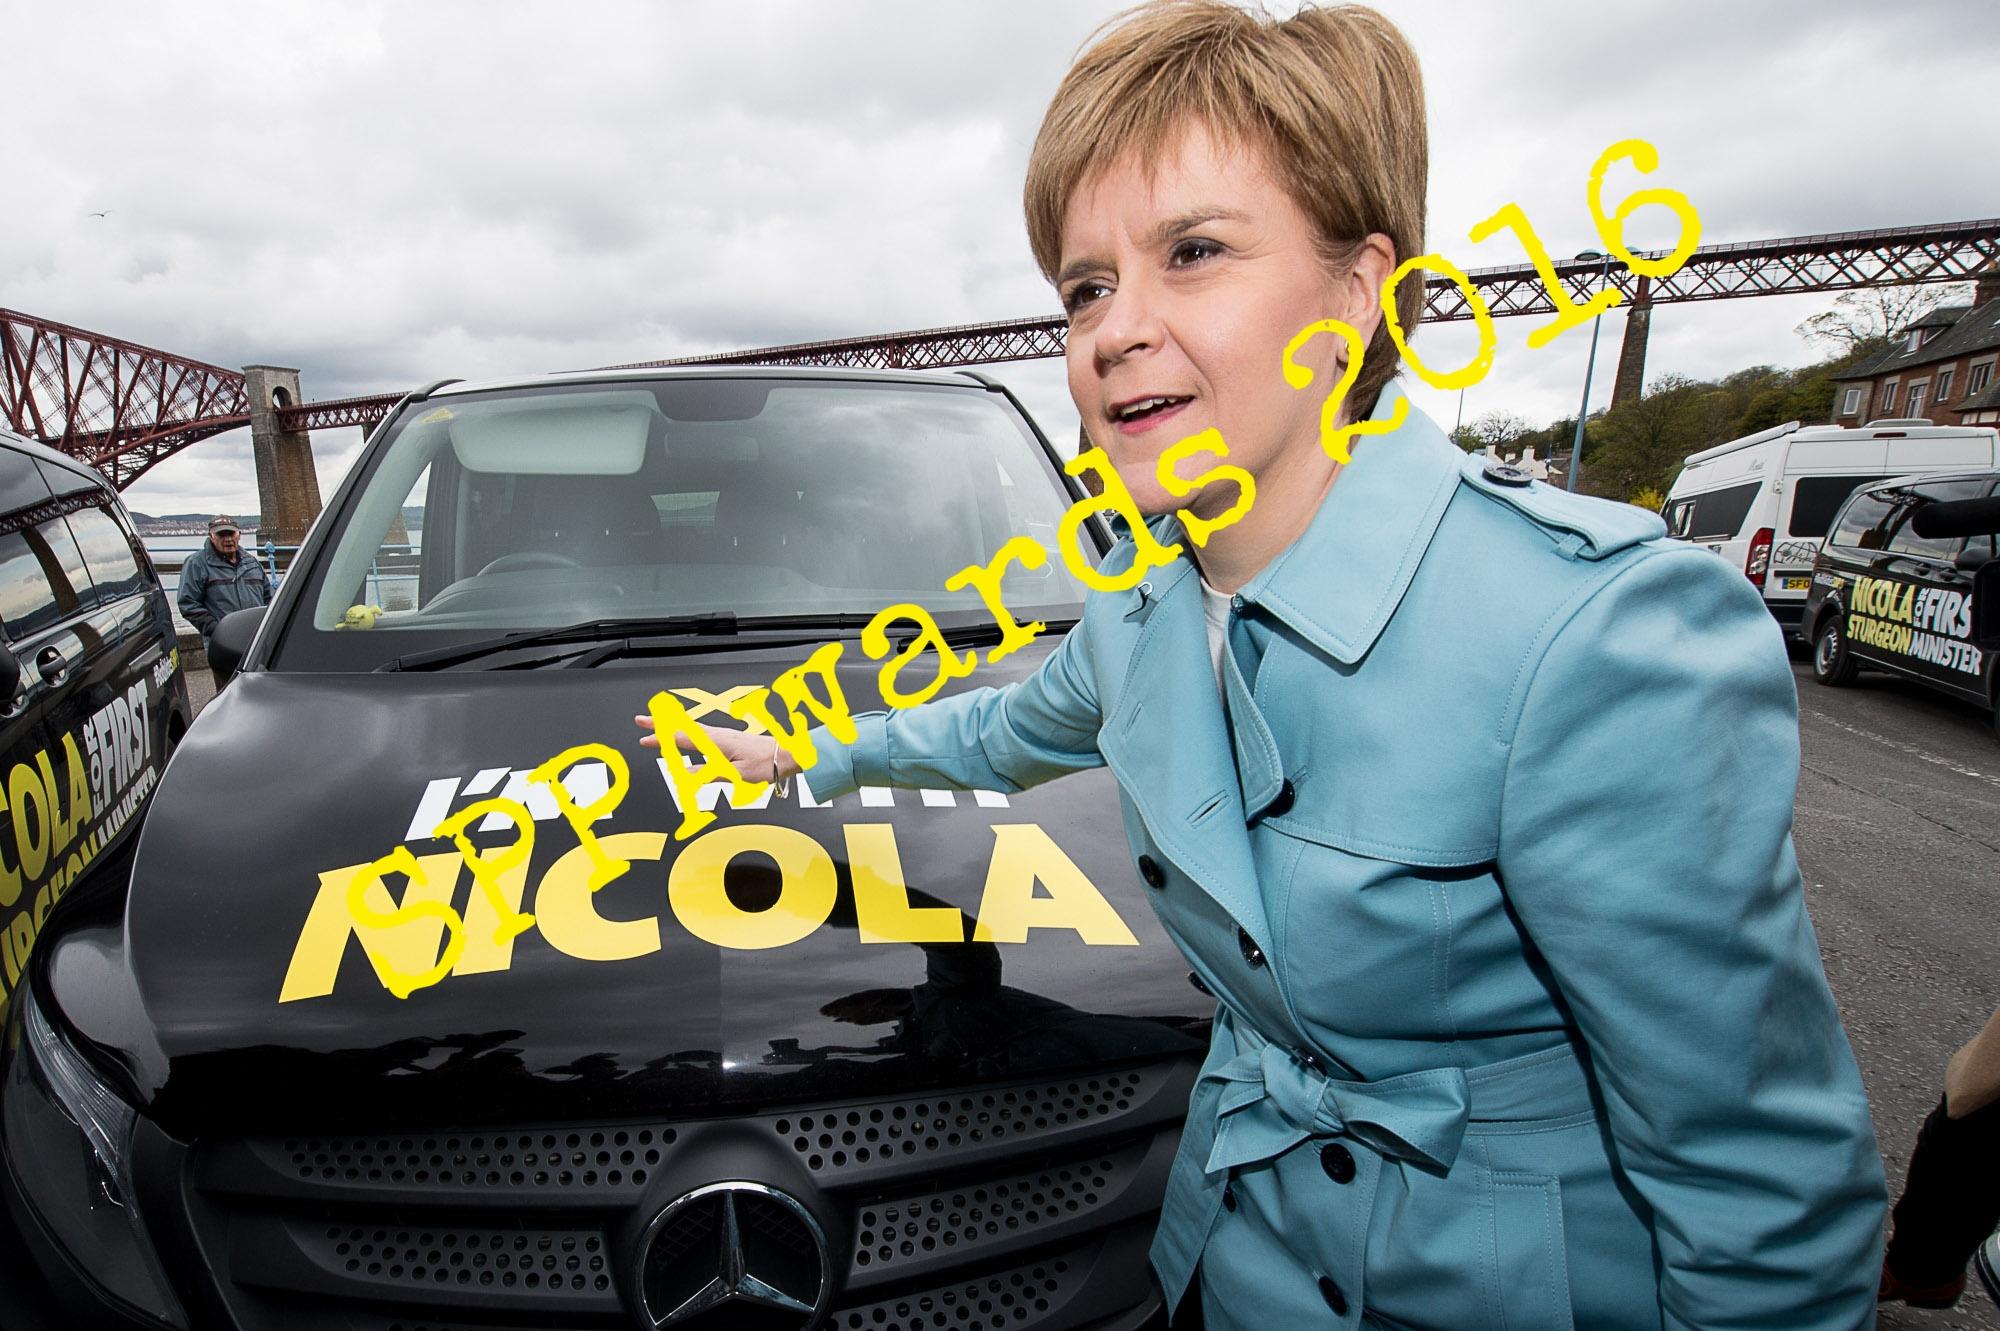 POLITICS_NICOLA_ONE_WEEK_TO_GO_DN-7.jpg